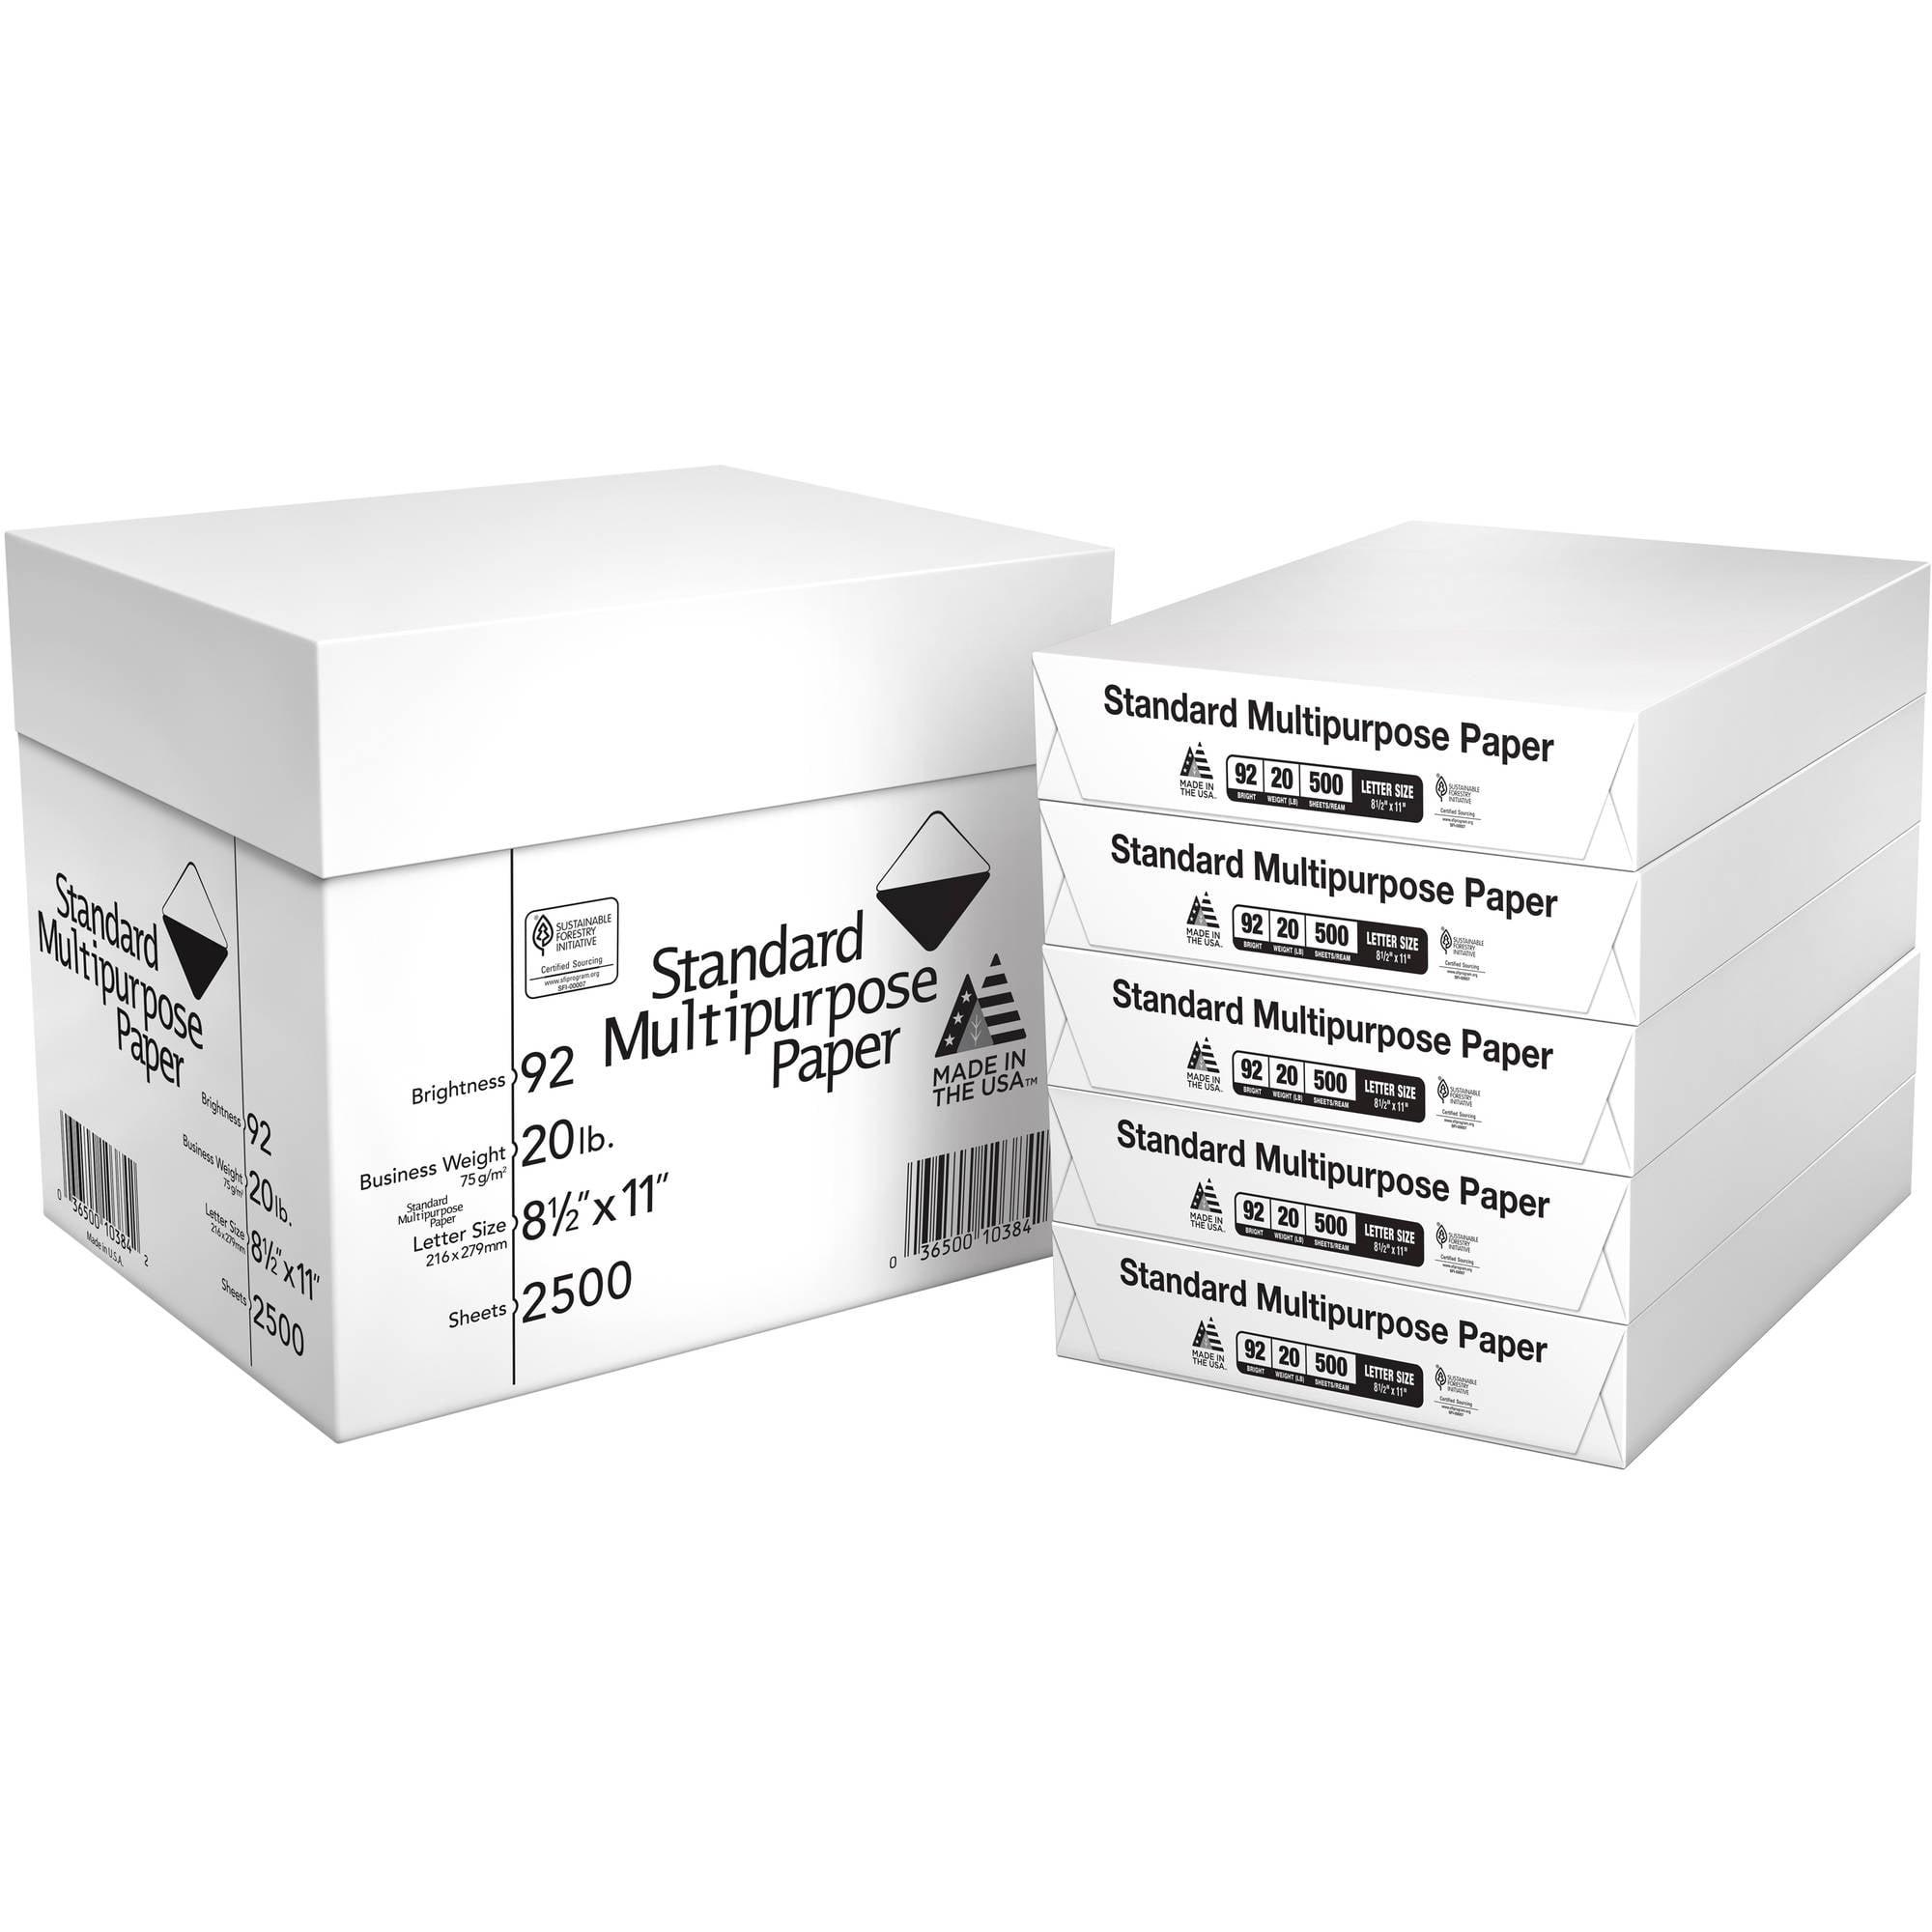 "Standard Multipurpose Paper, 8-1/2"" x 11"", 92 Bright, 2500 Sheets, 5 Reams"